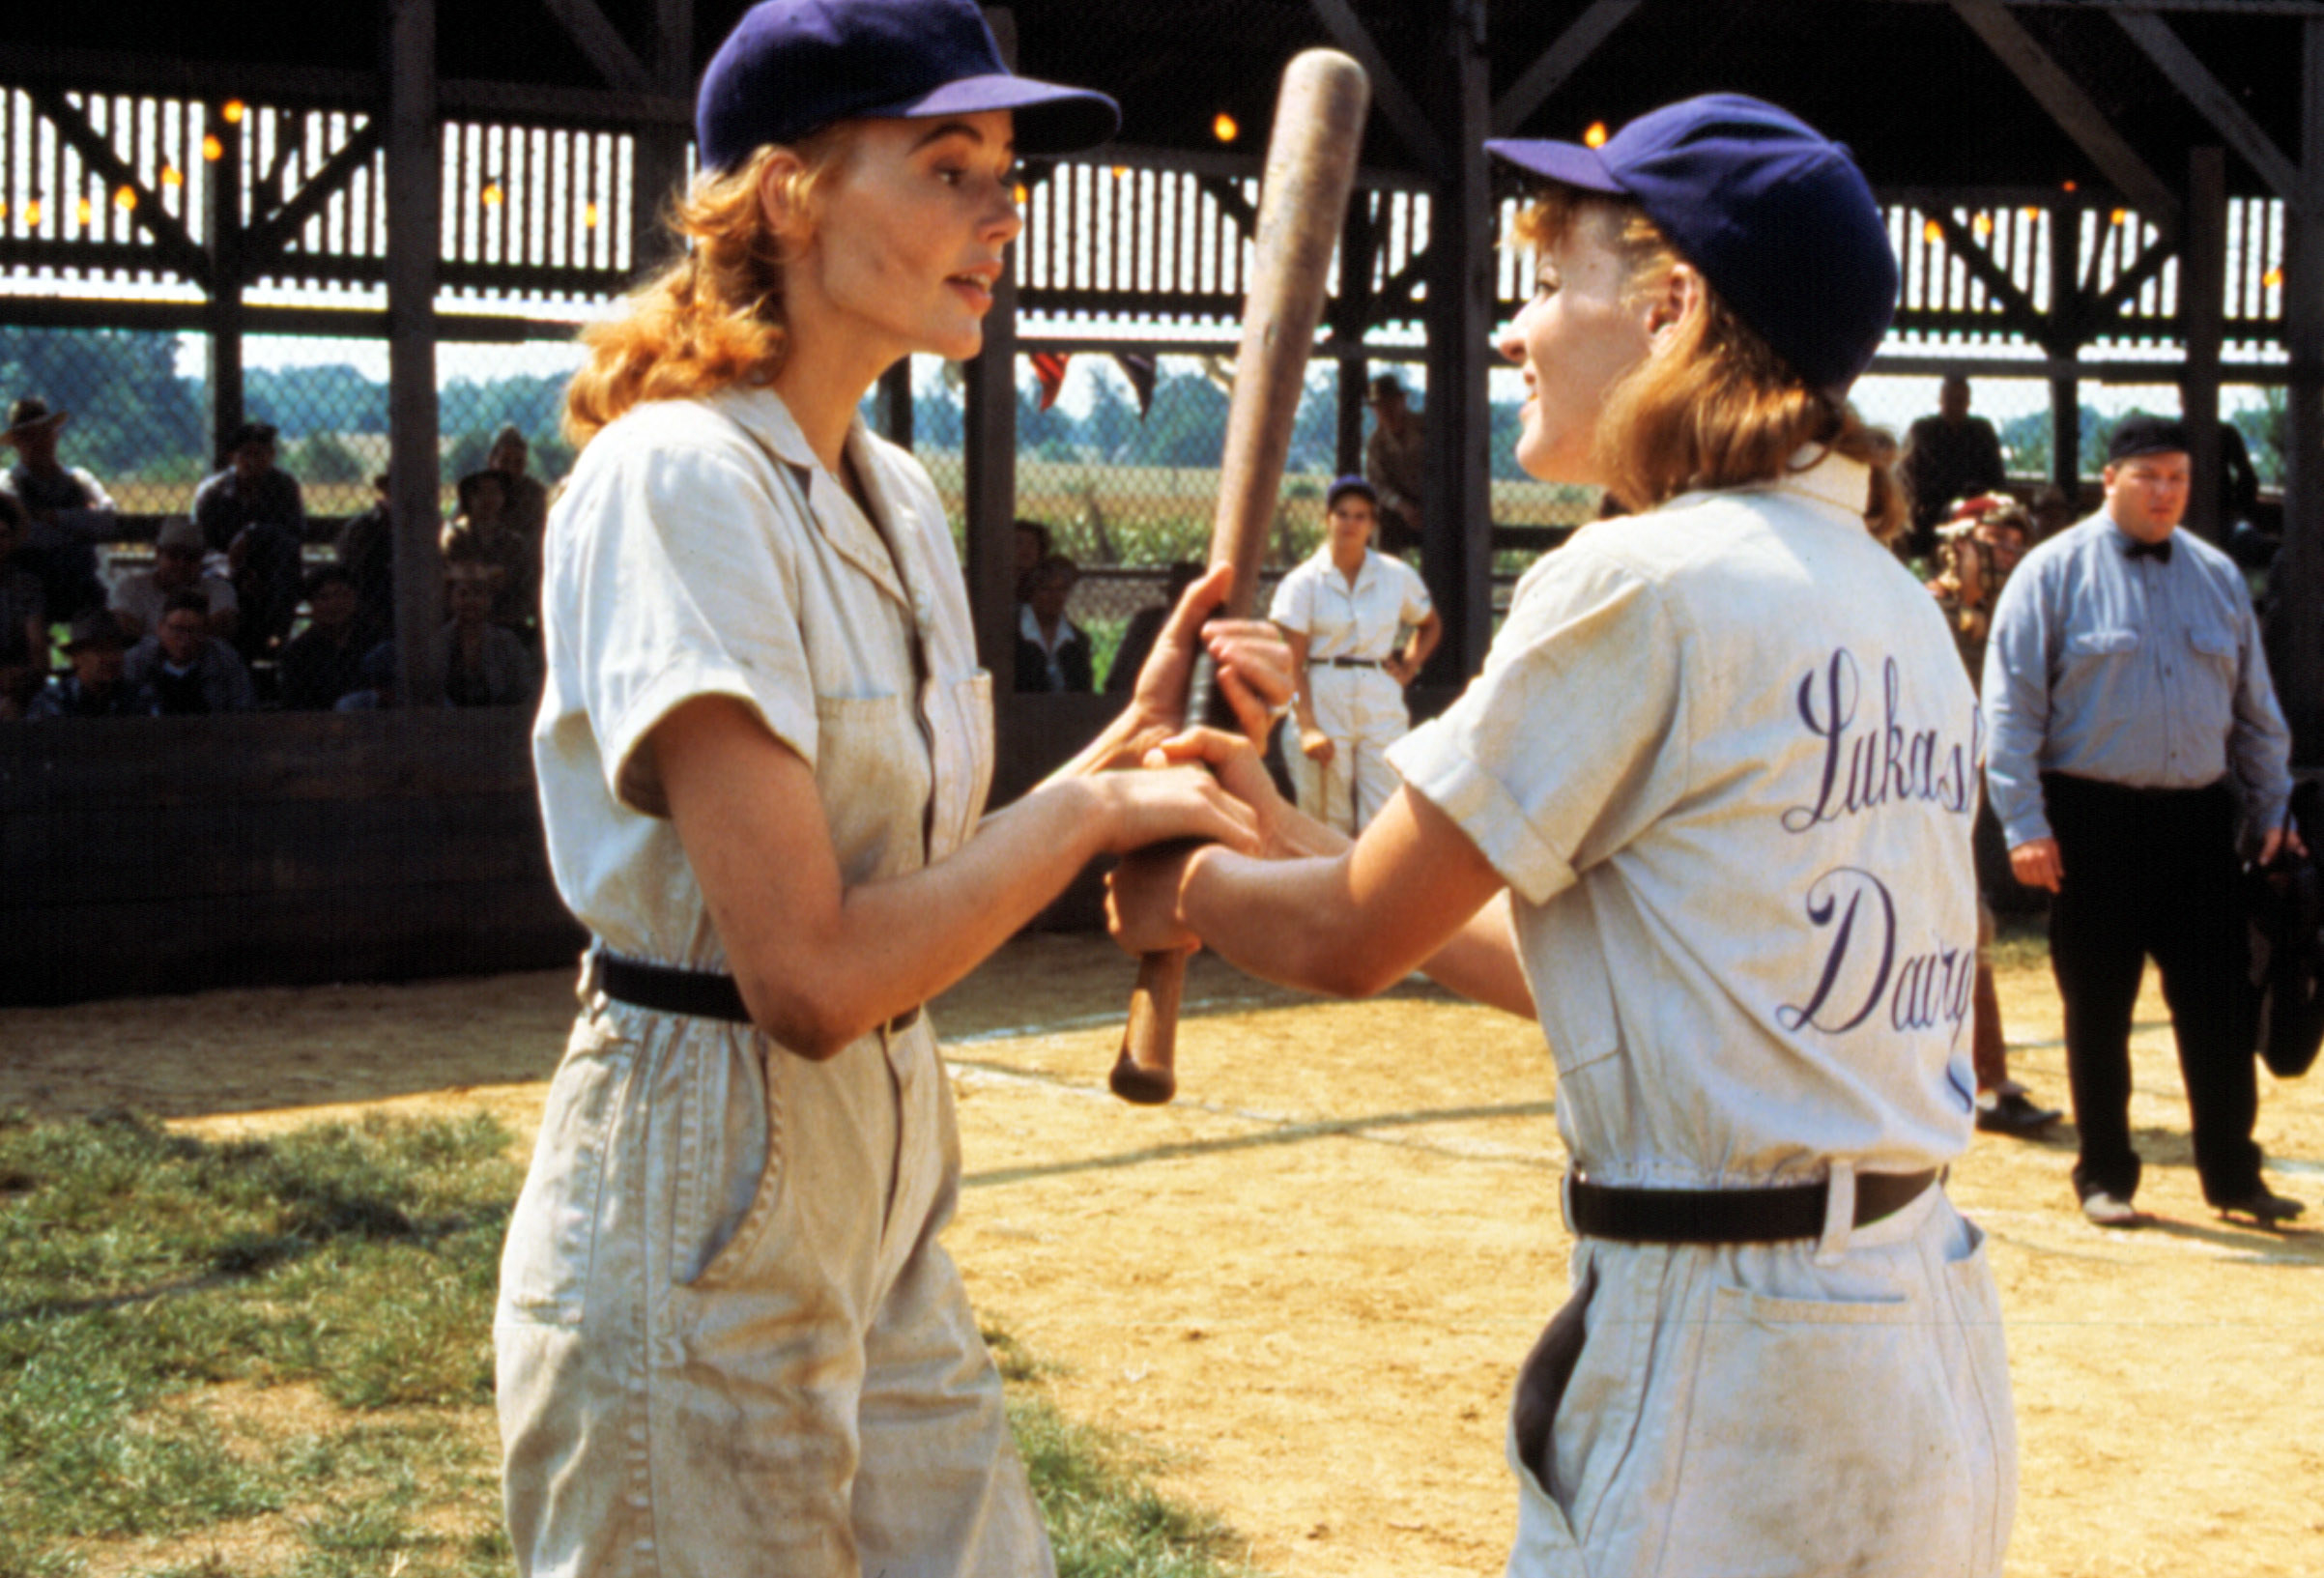 Geena Davis and Lori Petty fighting over a baseball bat.